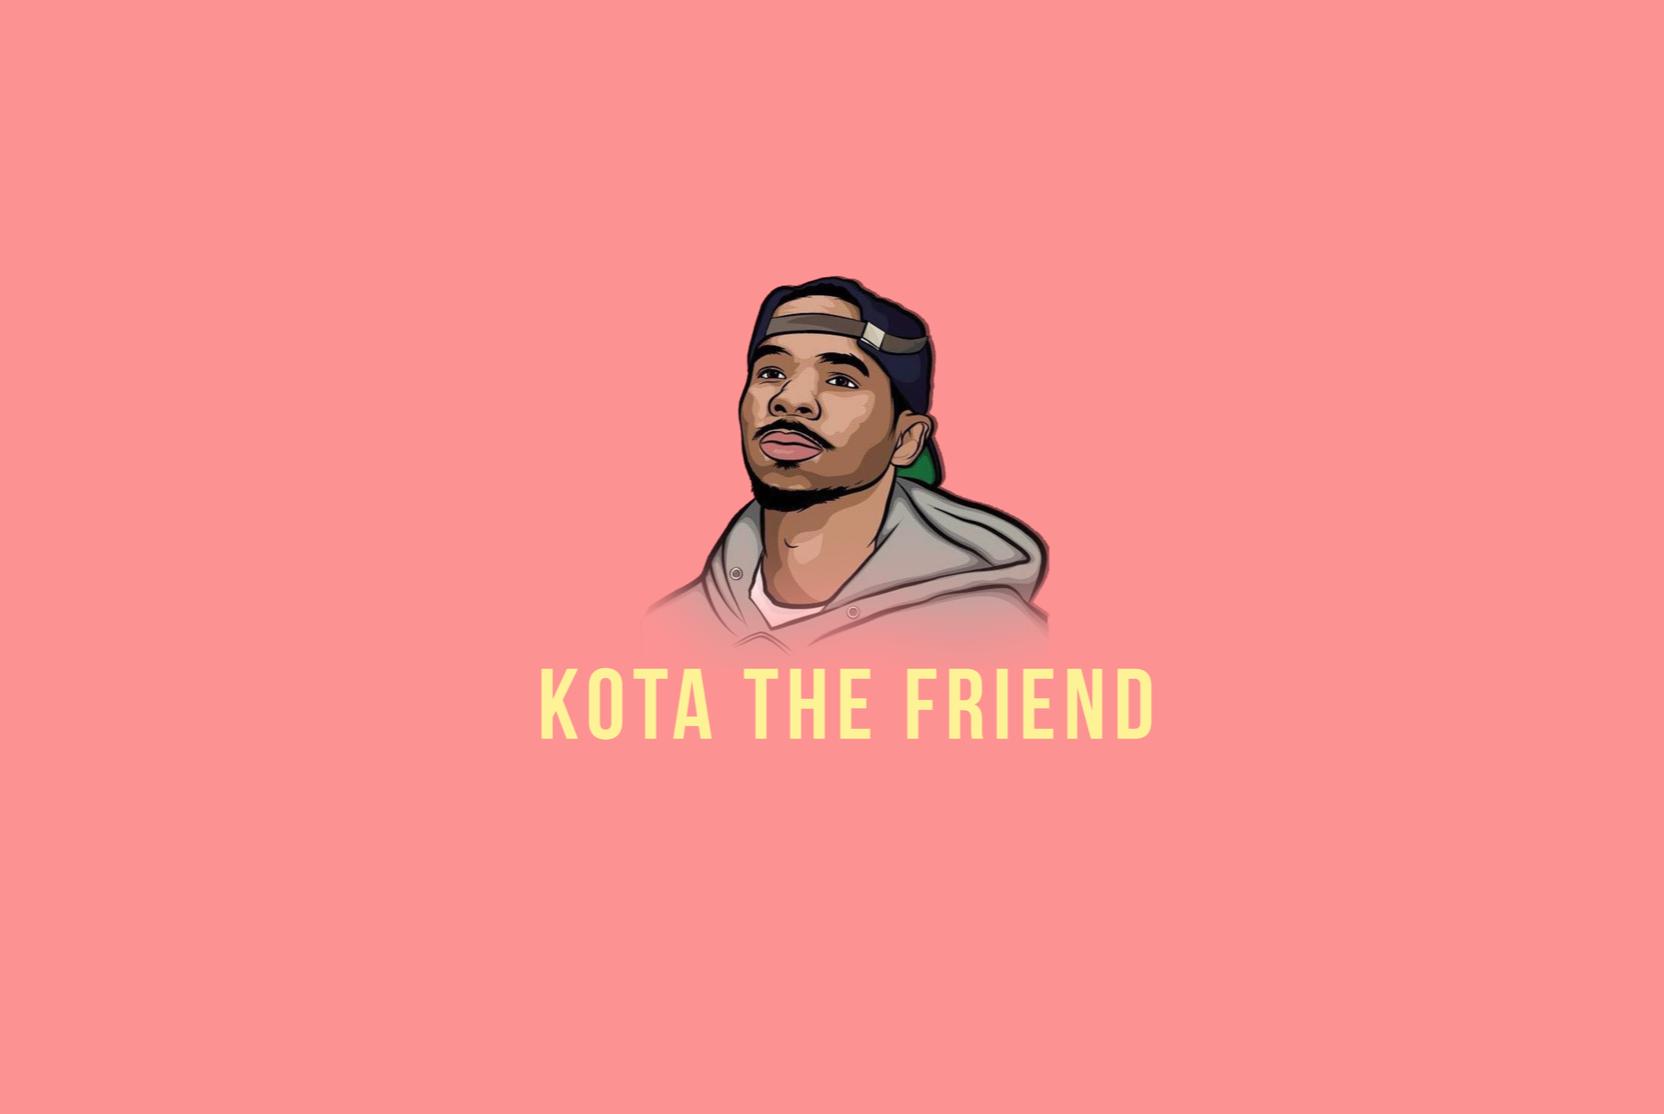 kotathefriend_1.png